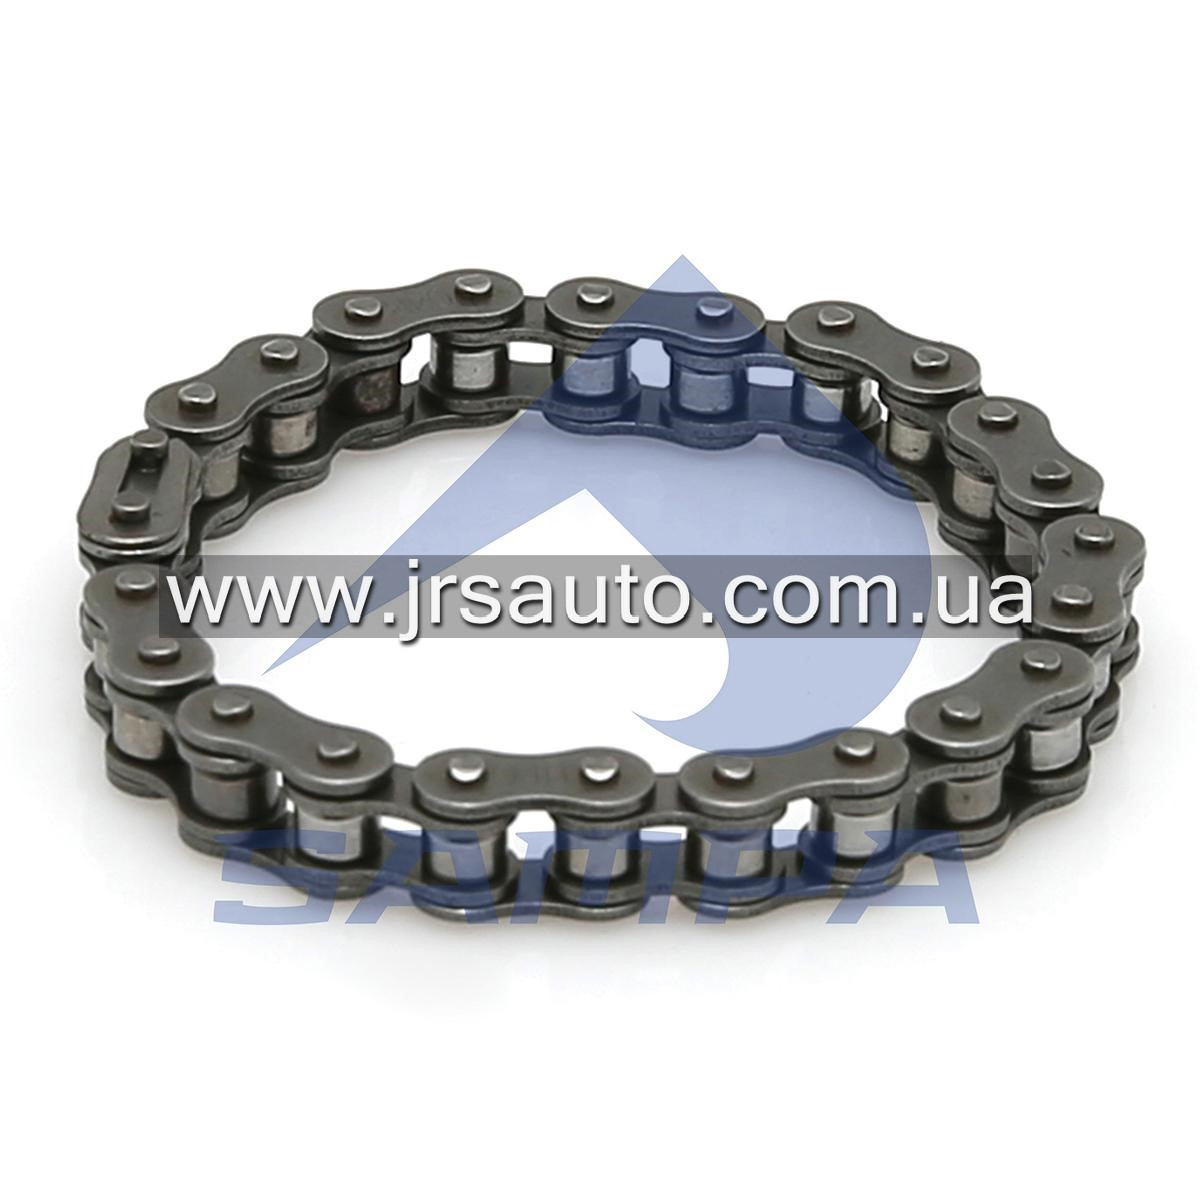 Цепь суппорта тормозной KNORR BREMSE (DIN 8187/1-04-24) \095.087